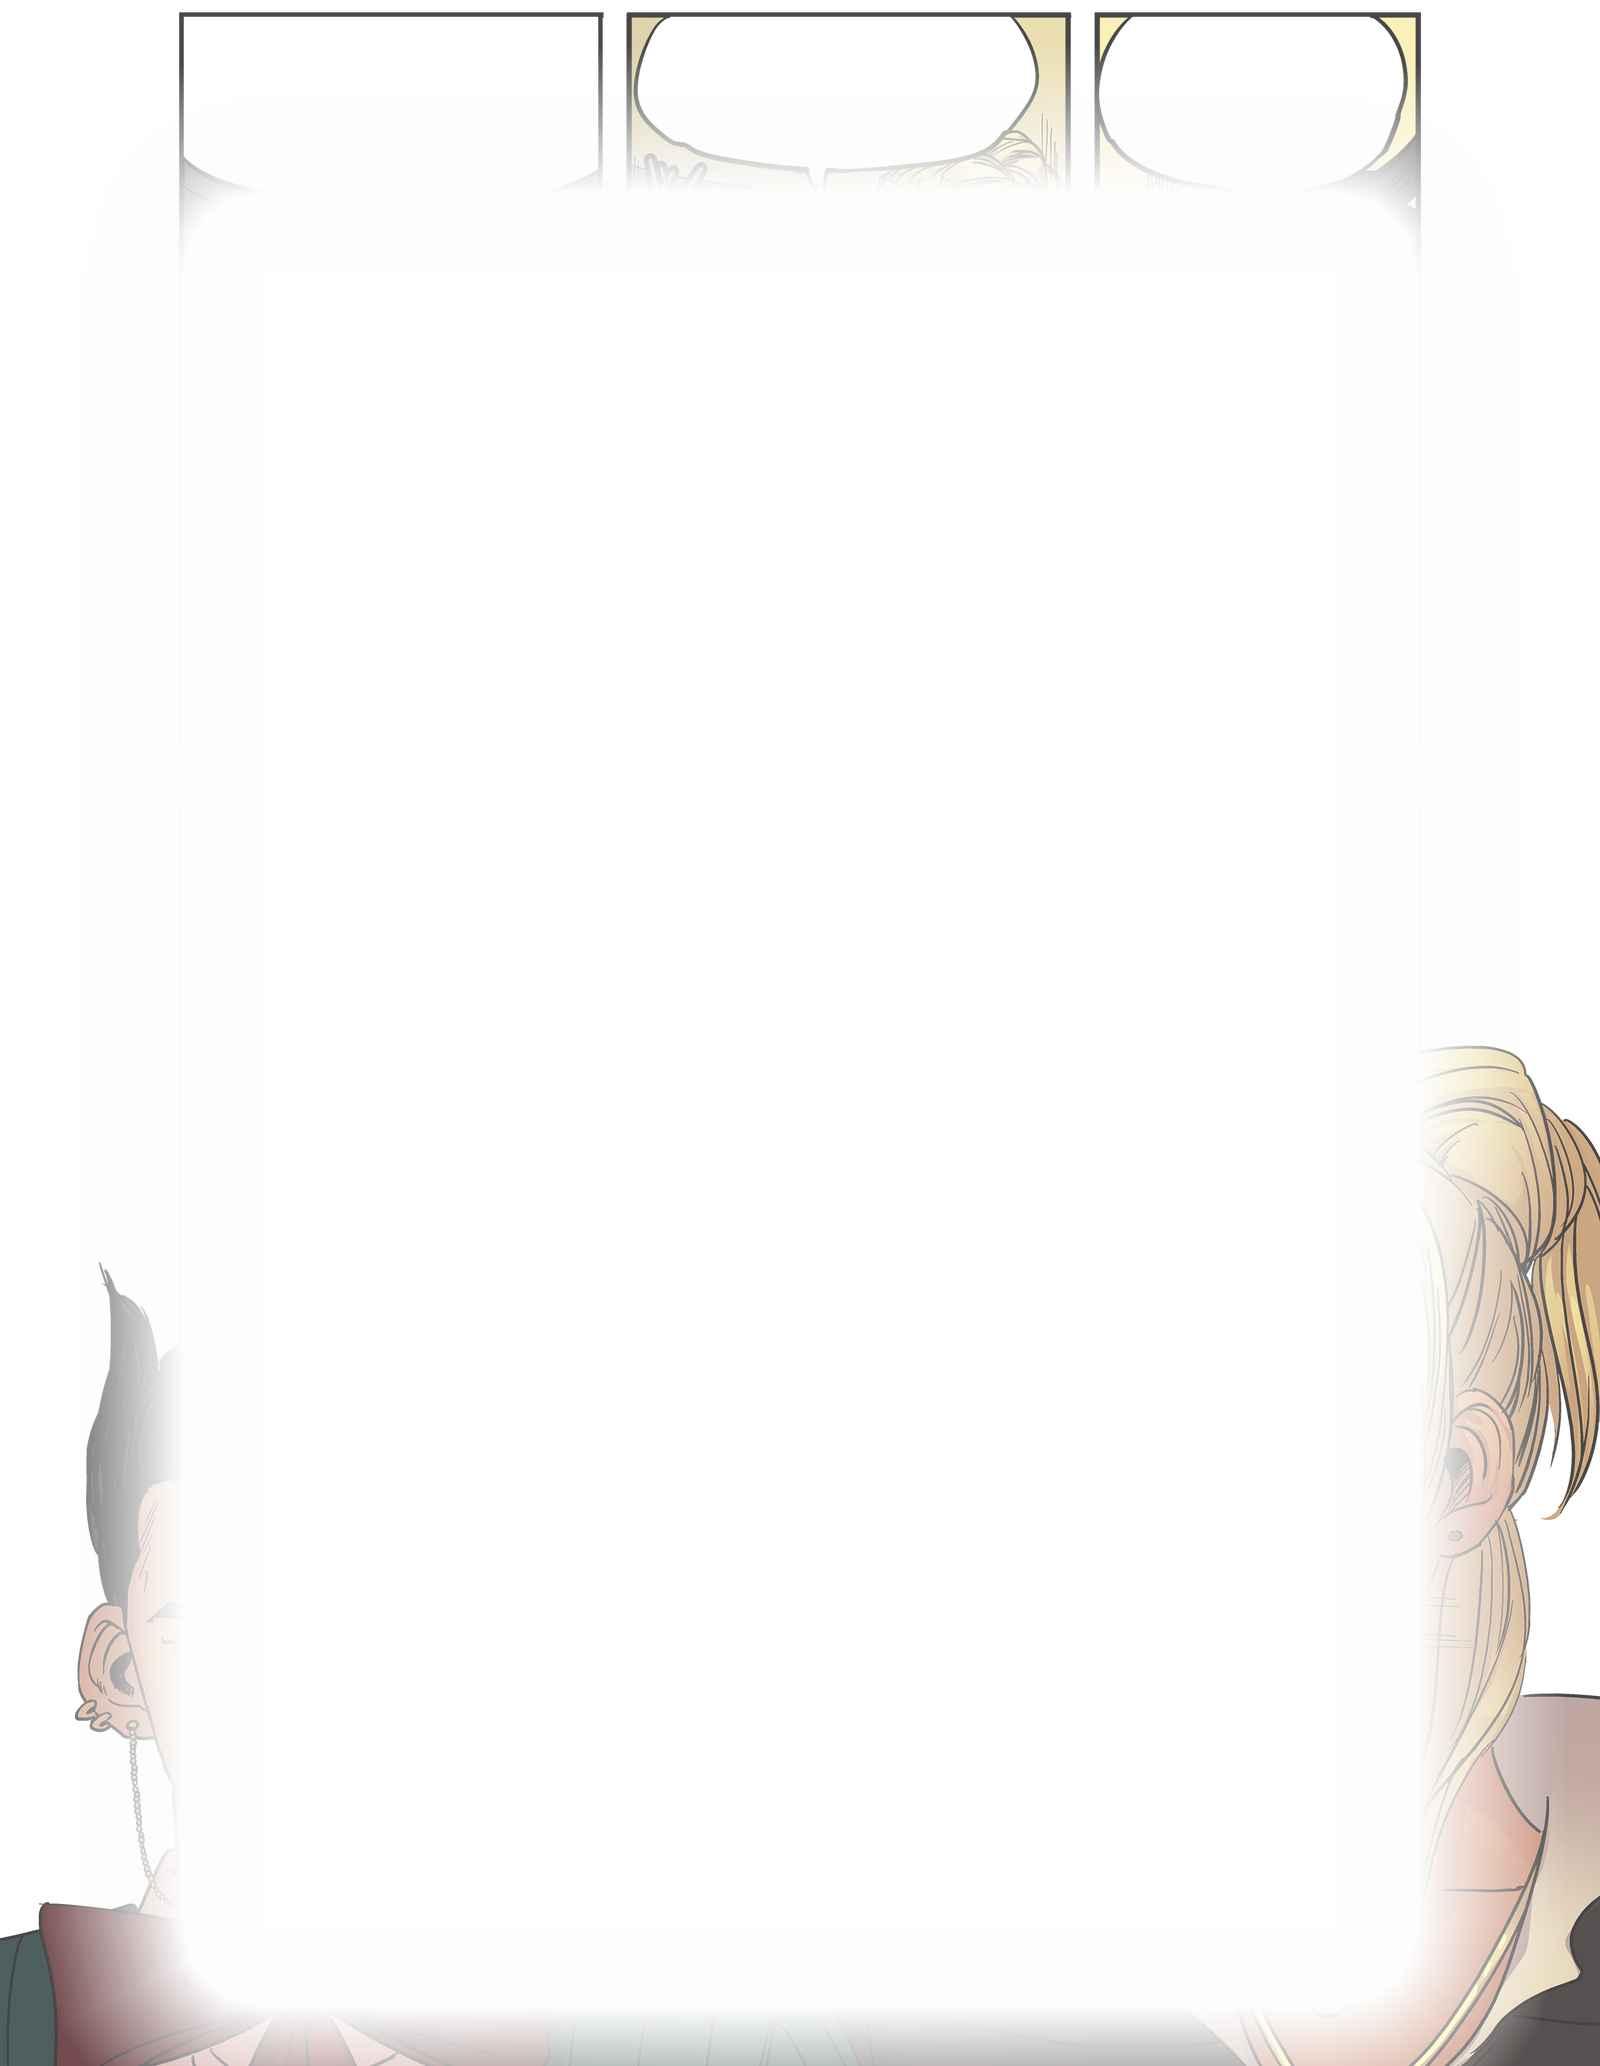 Amilova : Chapitre 7 page 12